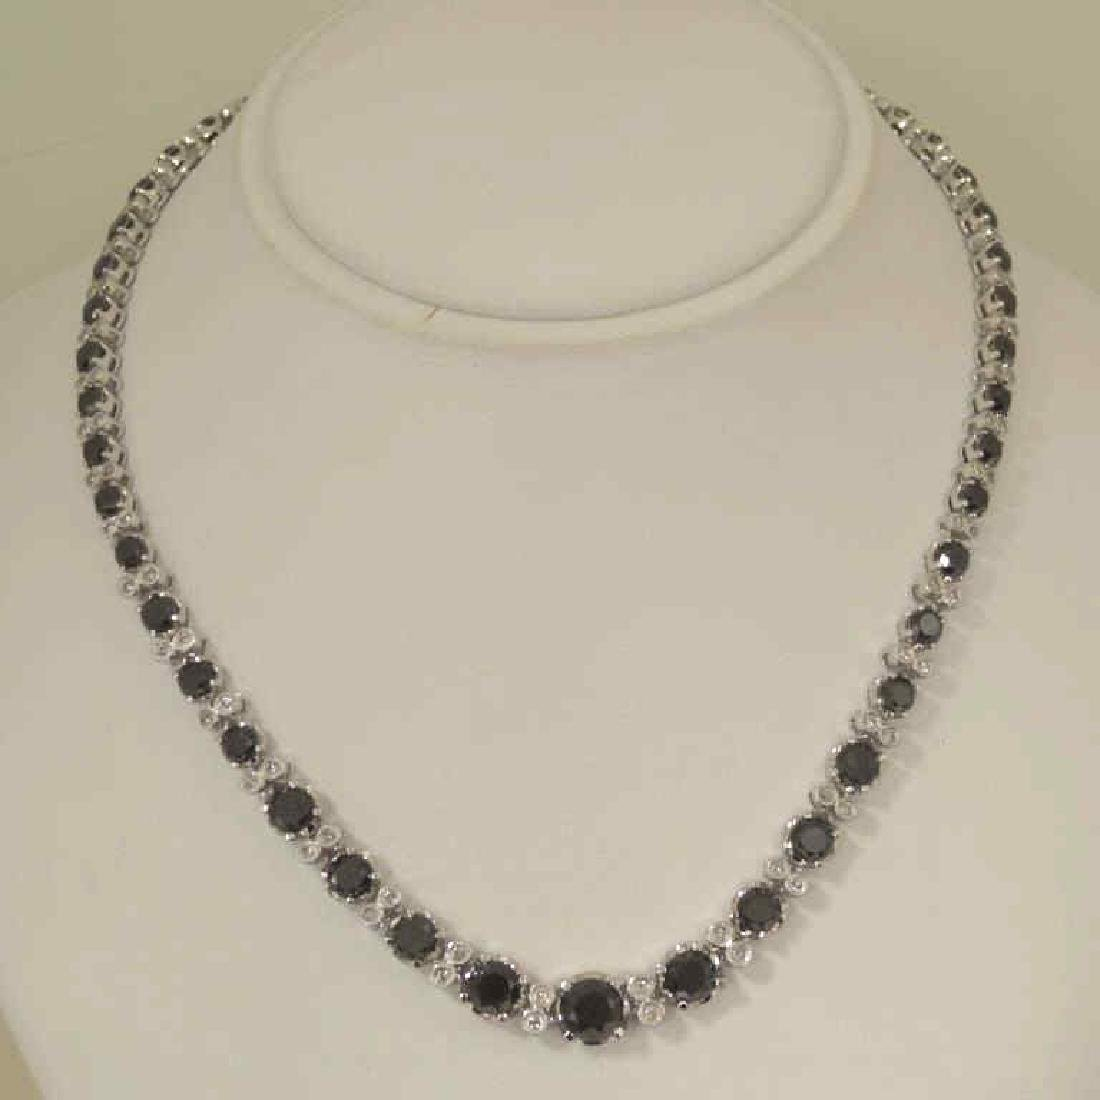 14kt white gold black diamond necklace